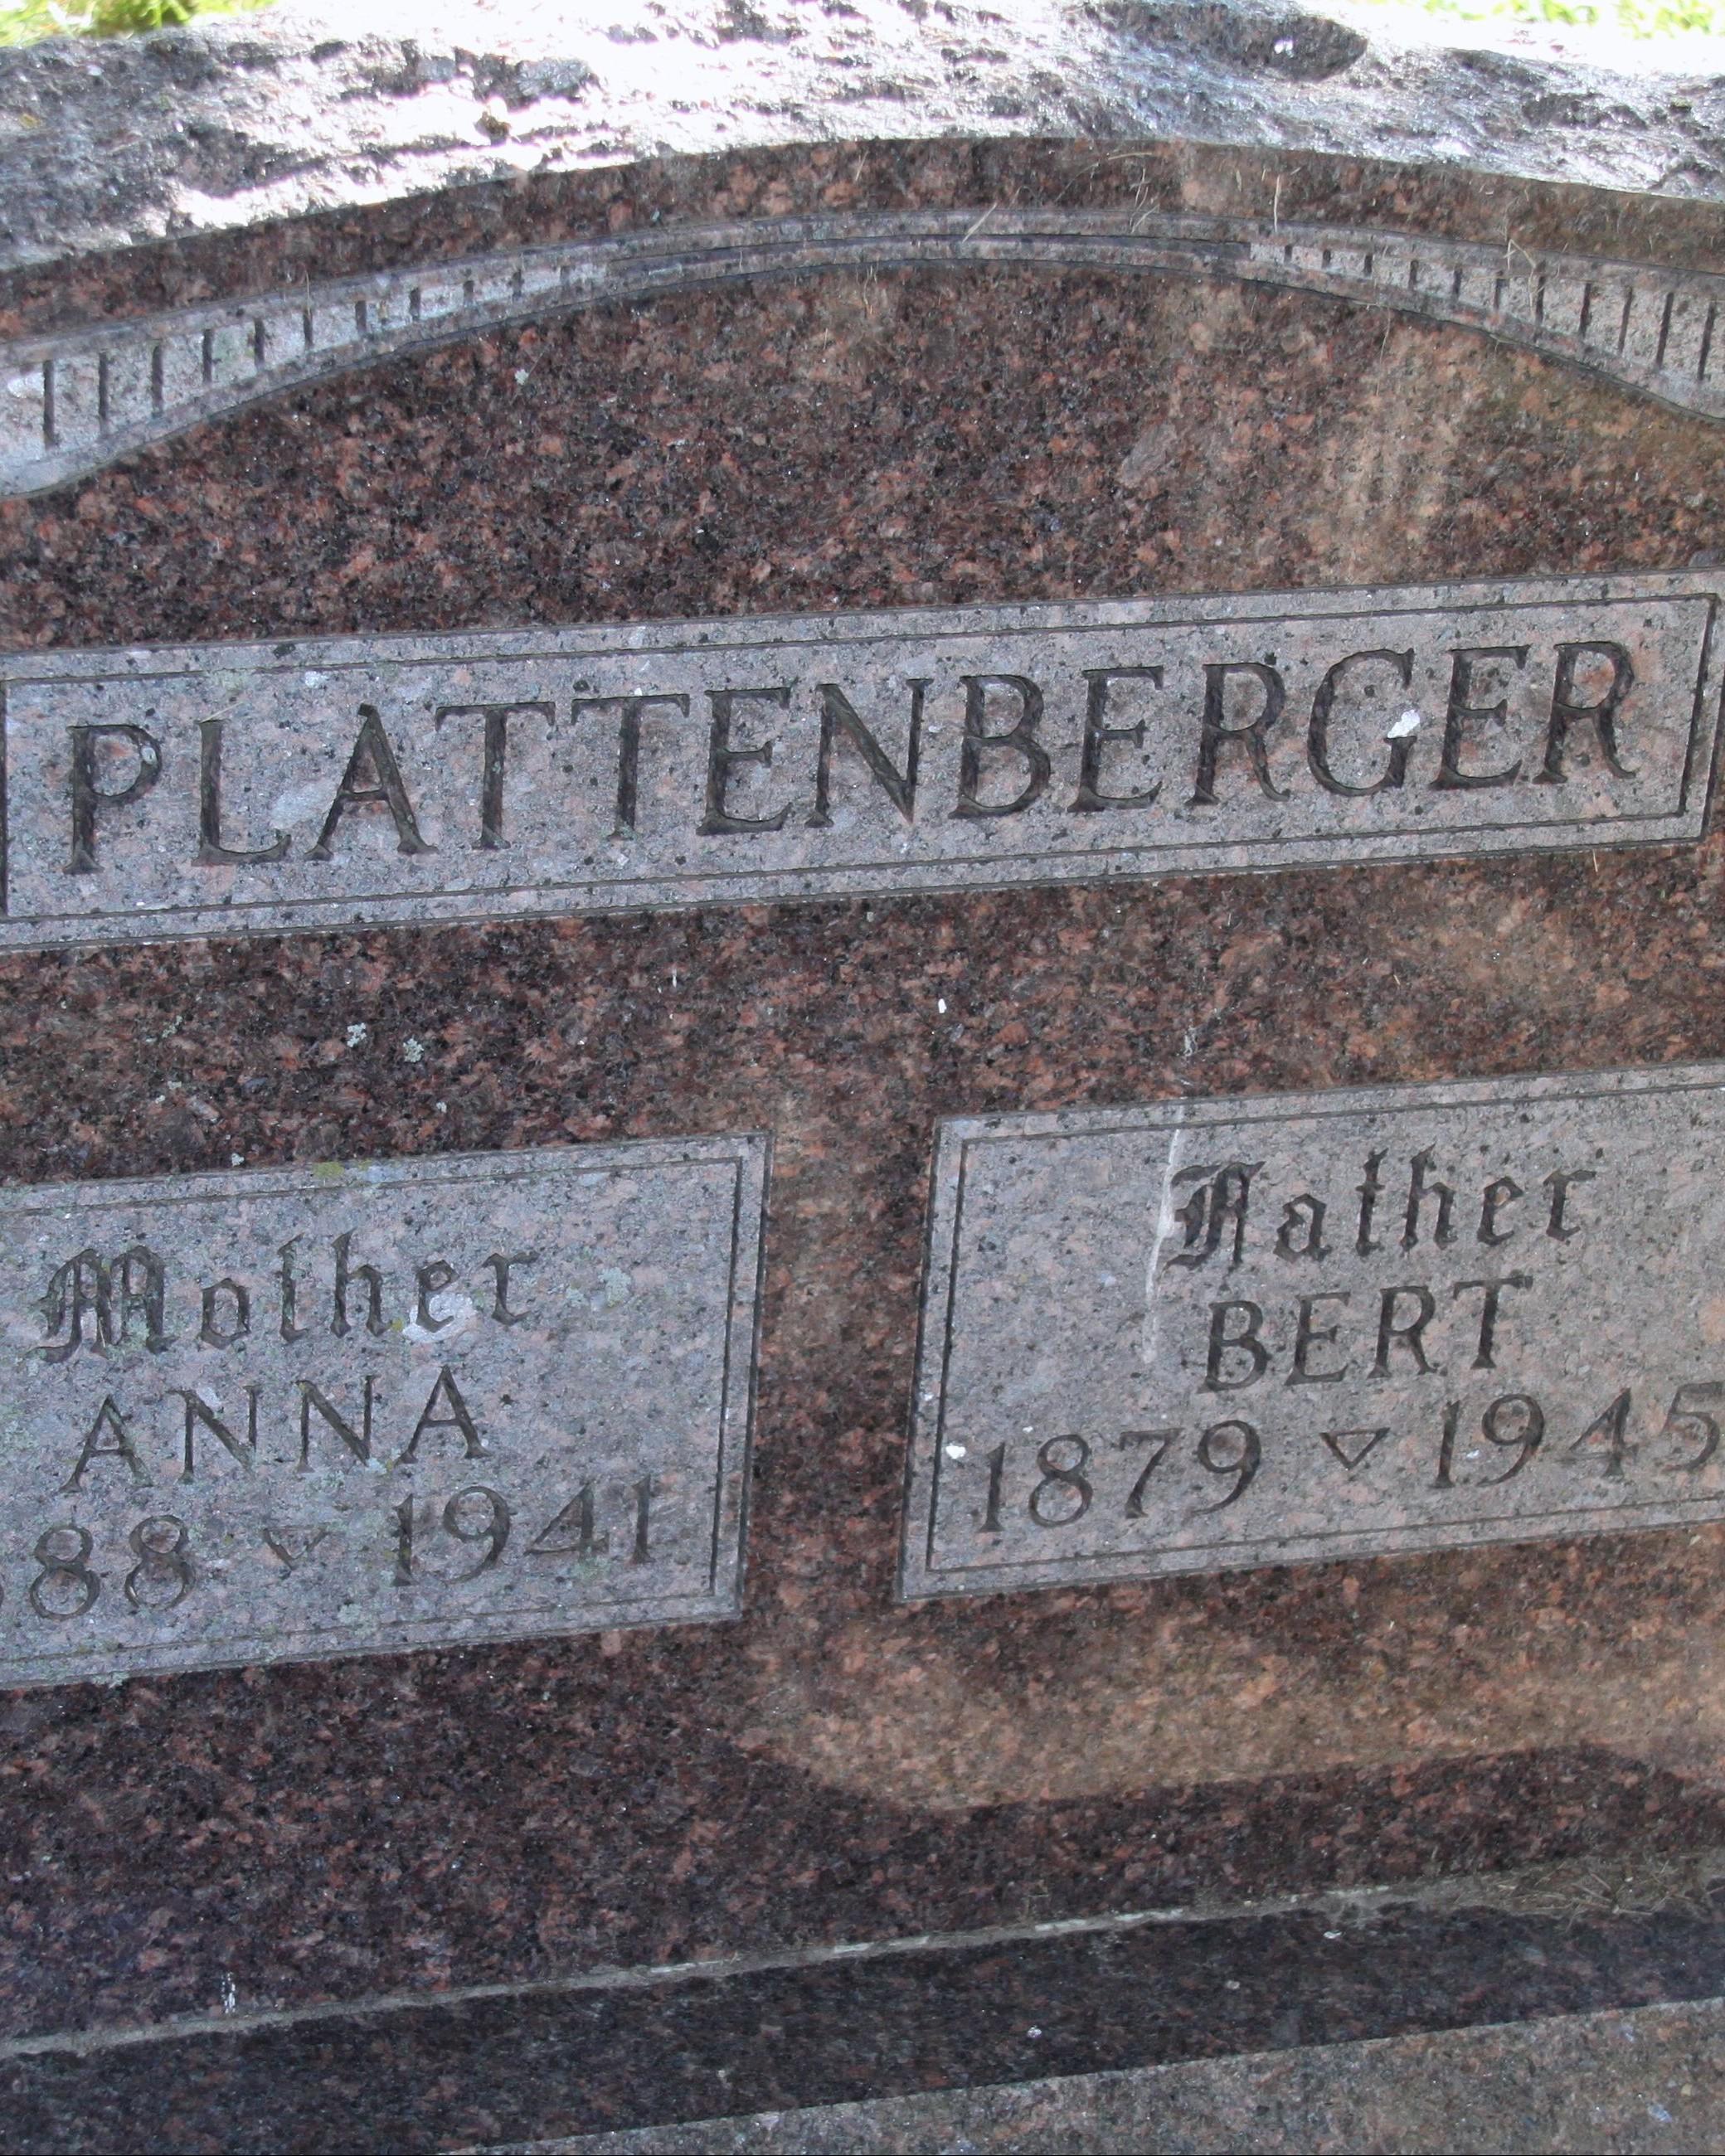 Police Officer Bert Sylvester Plattenberger   Savanna Police Department, Illinois